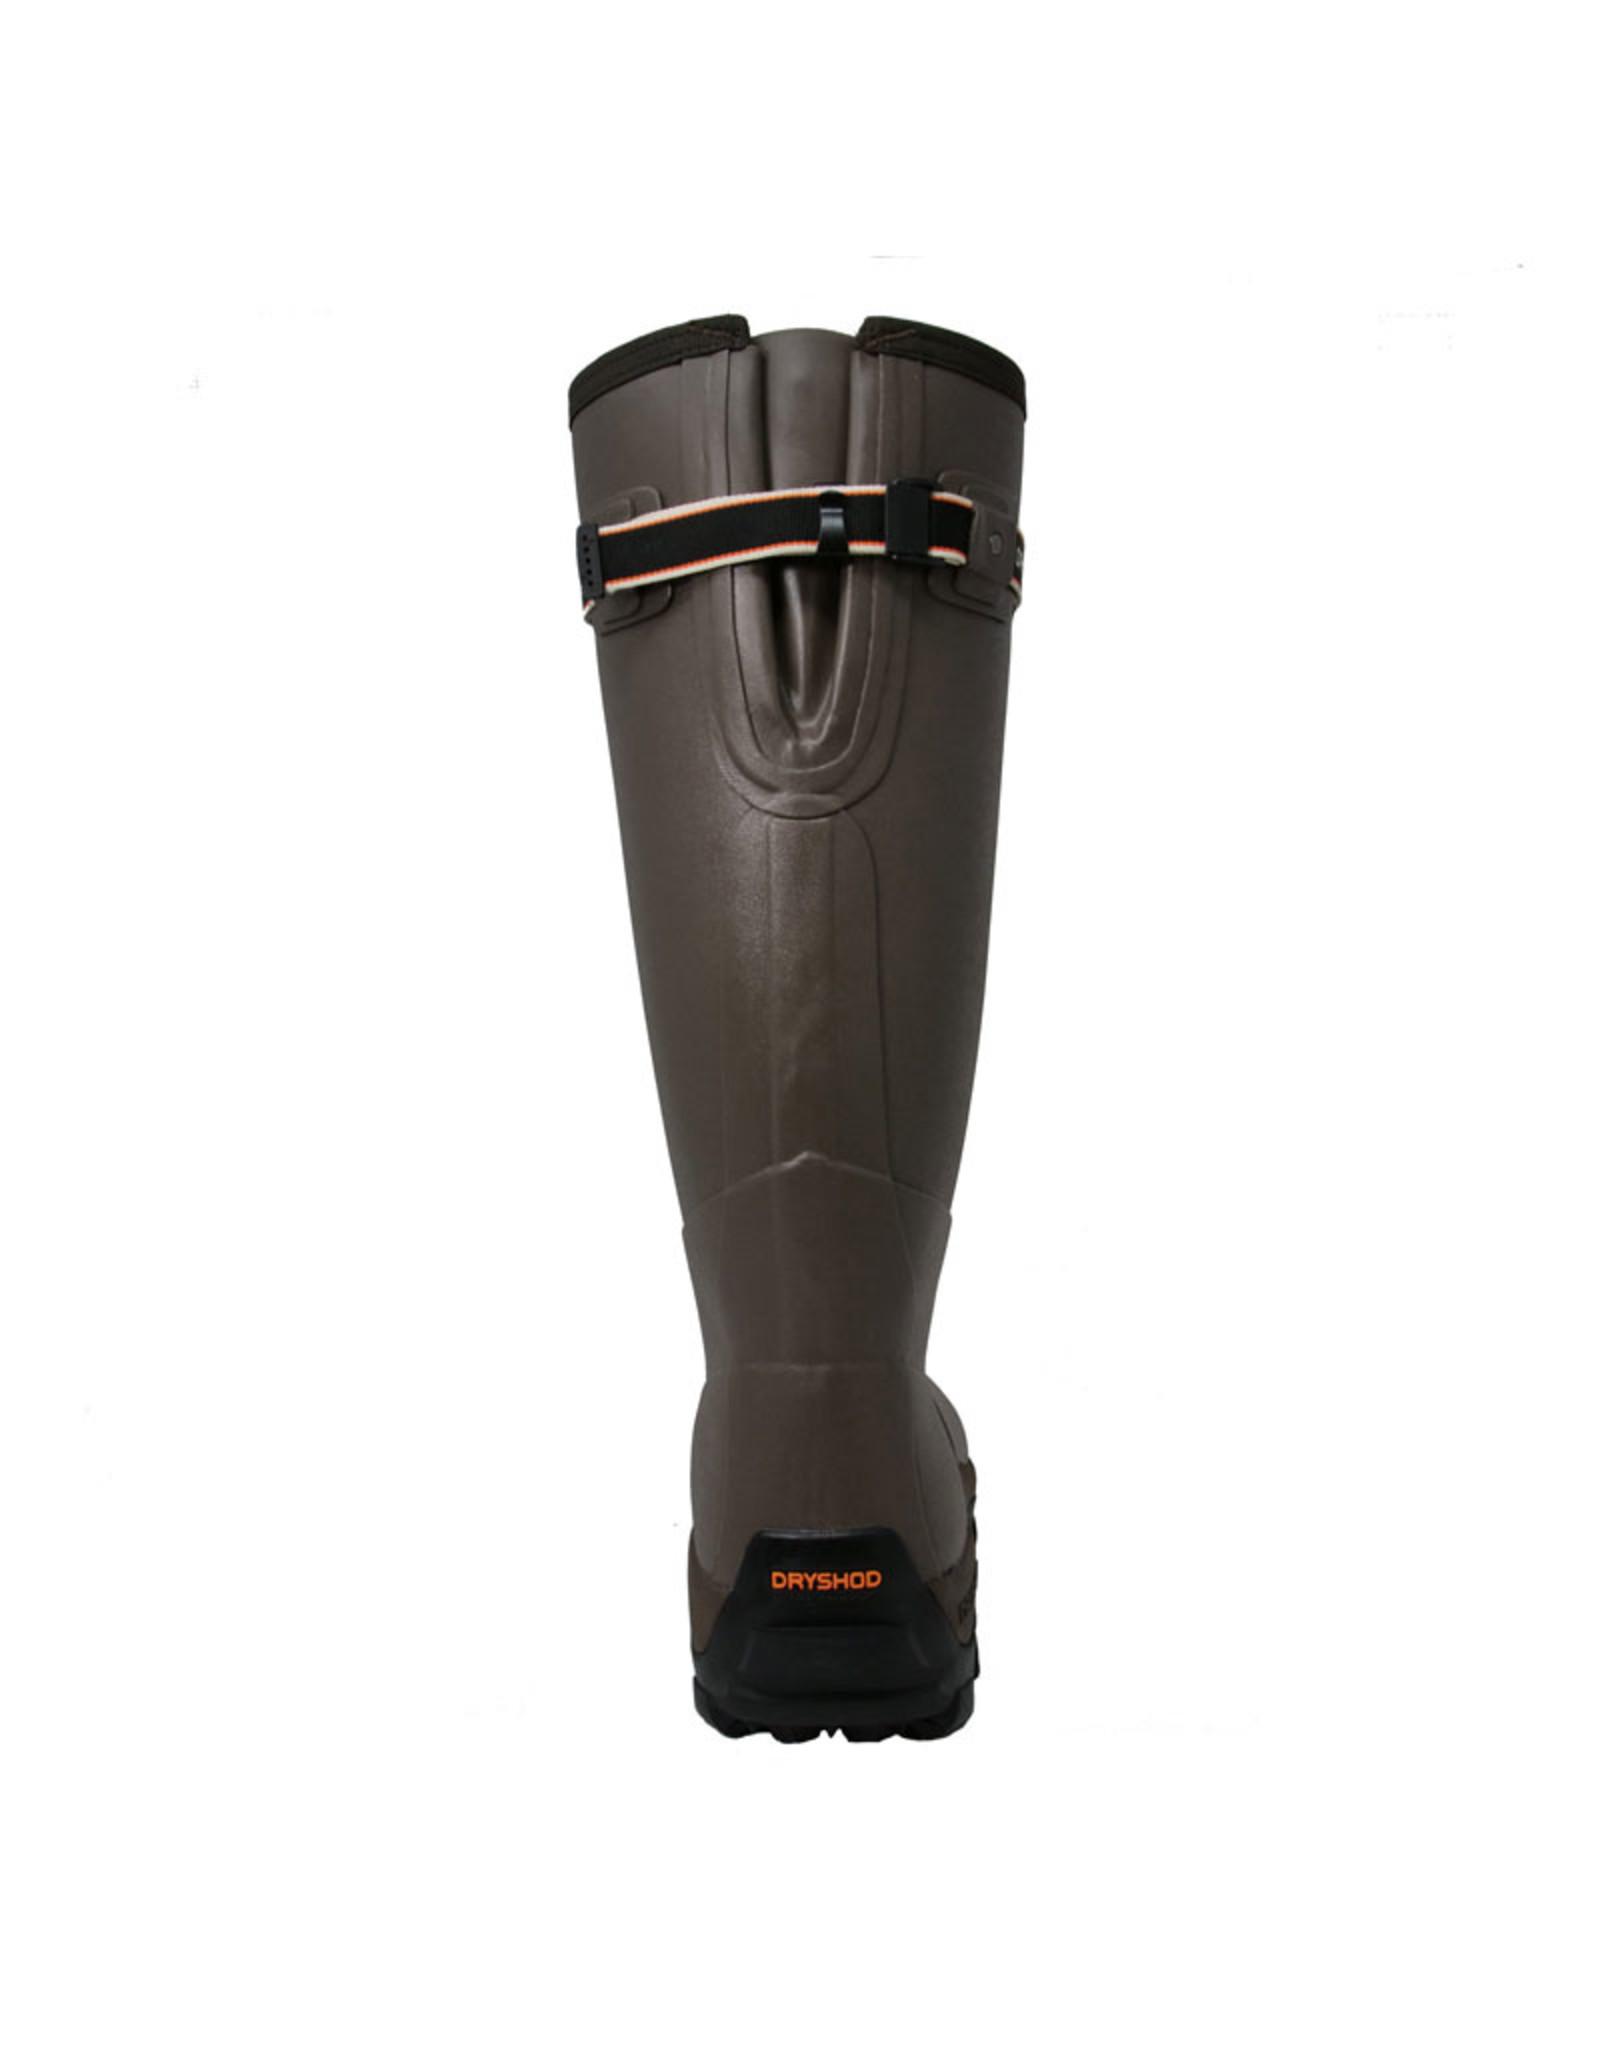 Boots-Men DRYSHOD Destroyer Gusset